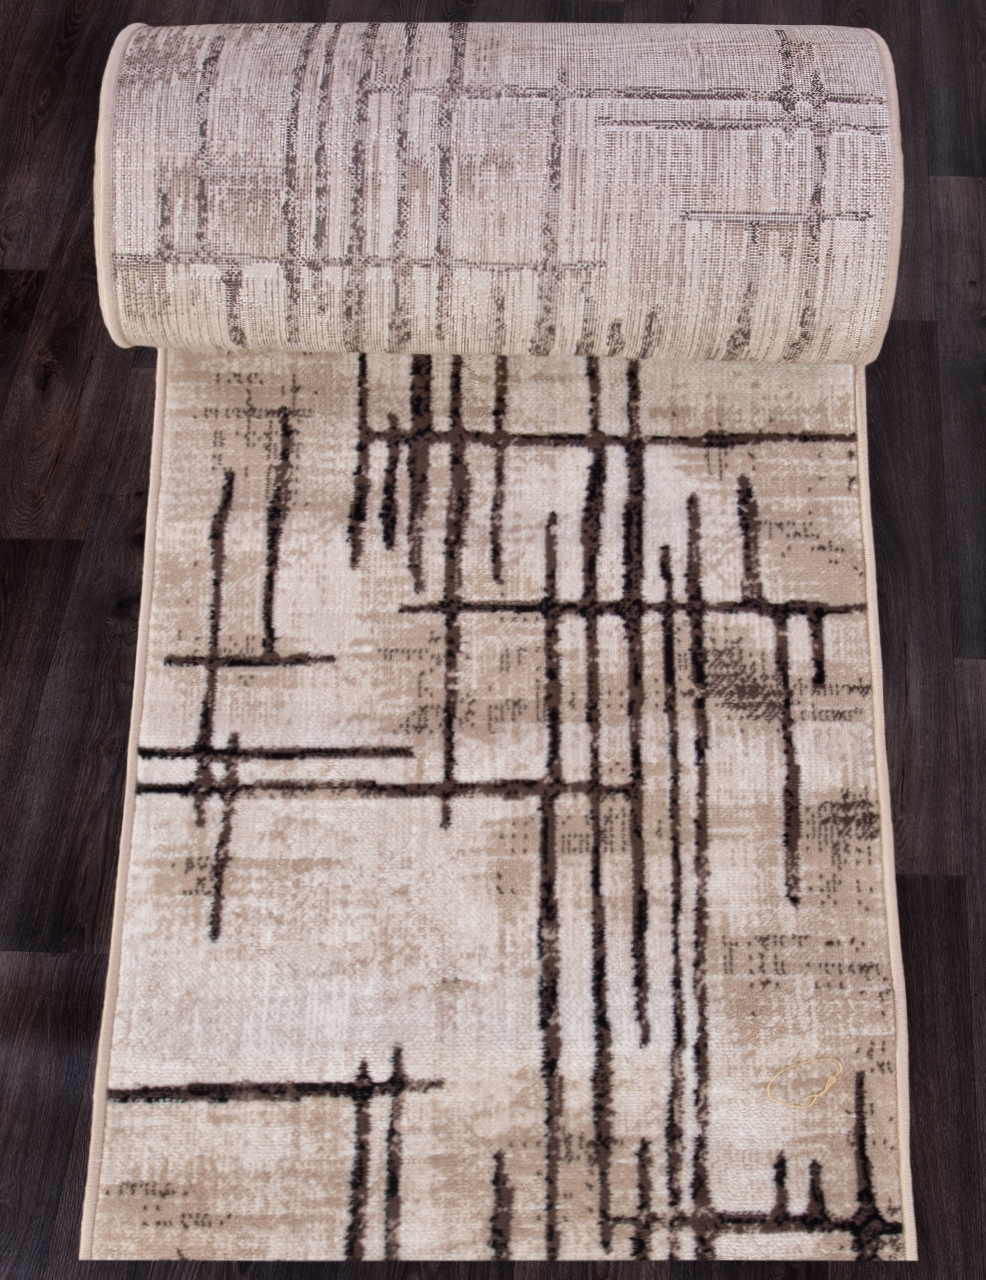 Ковровая дорожка D717 - BEIGE-BROWN - коллекция SIERRA - фото 1